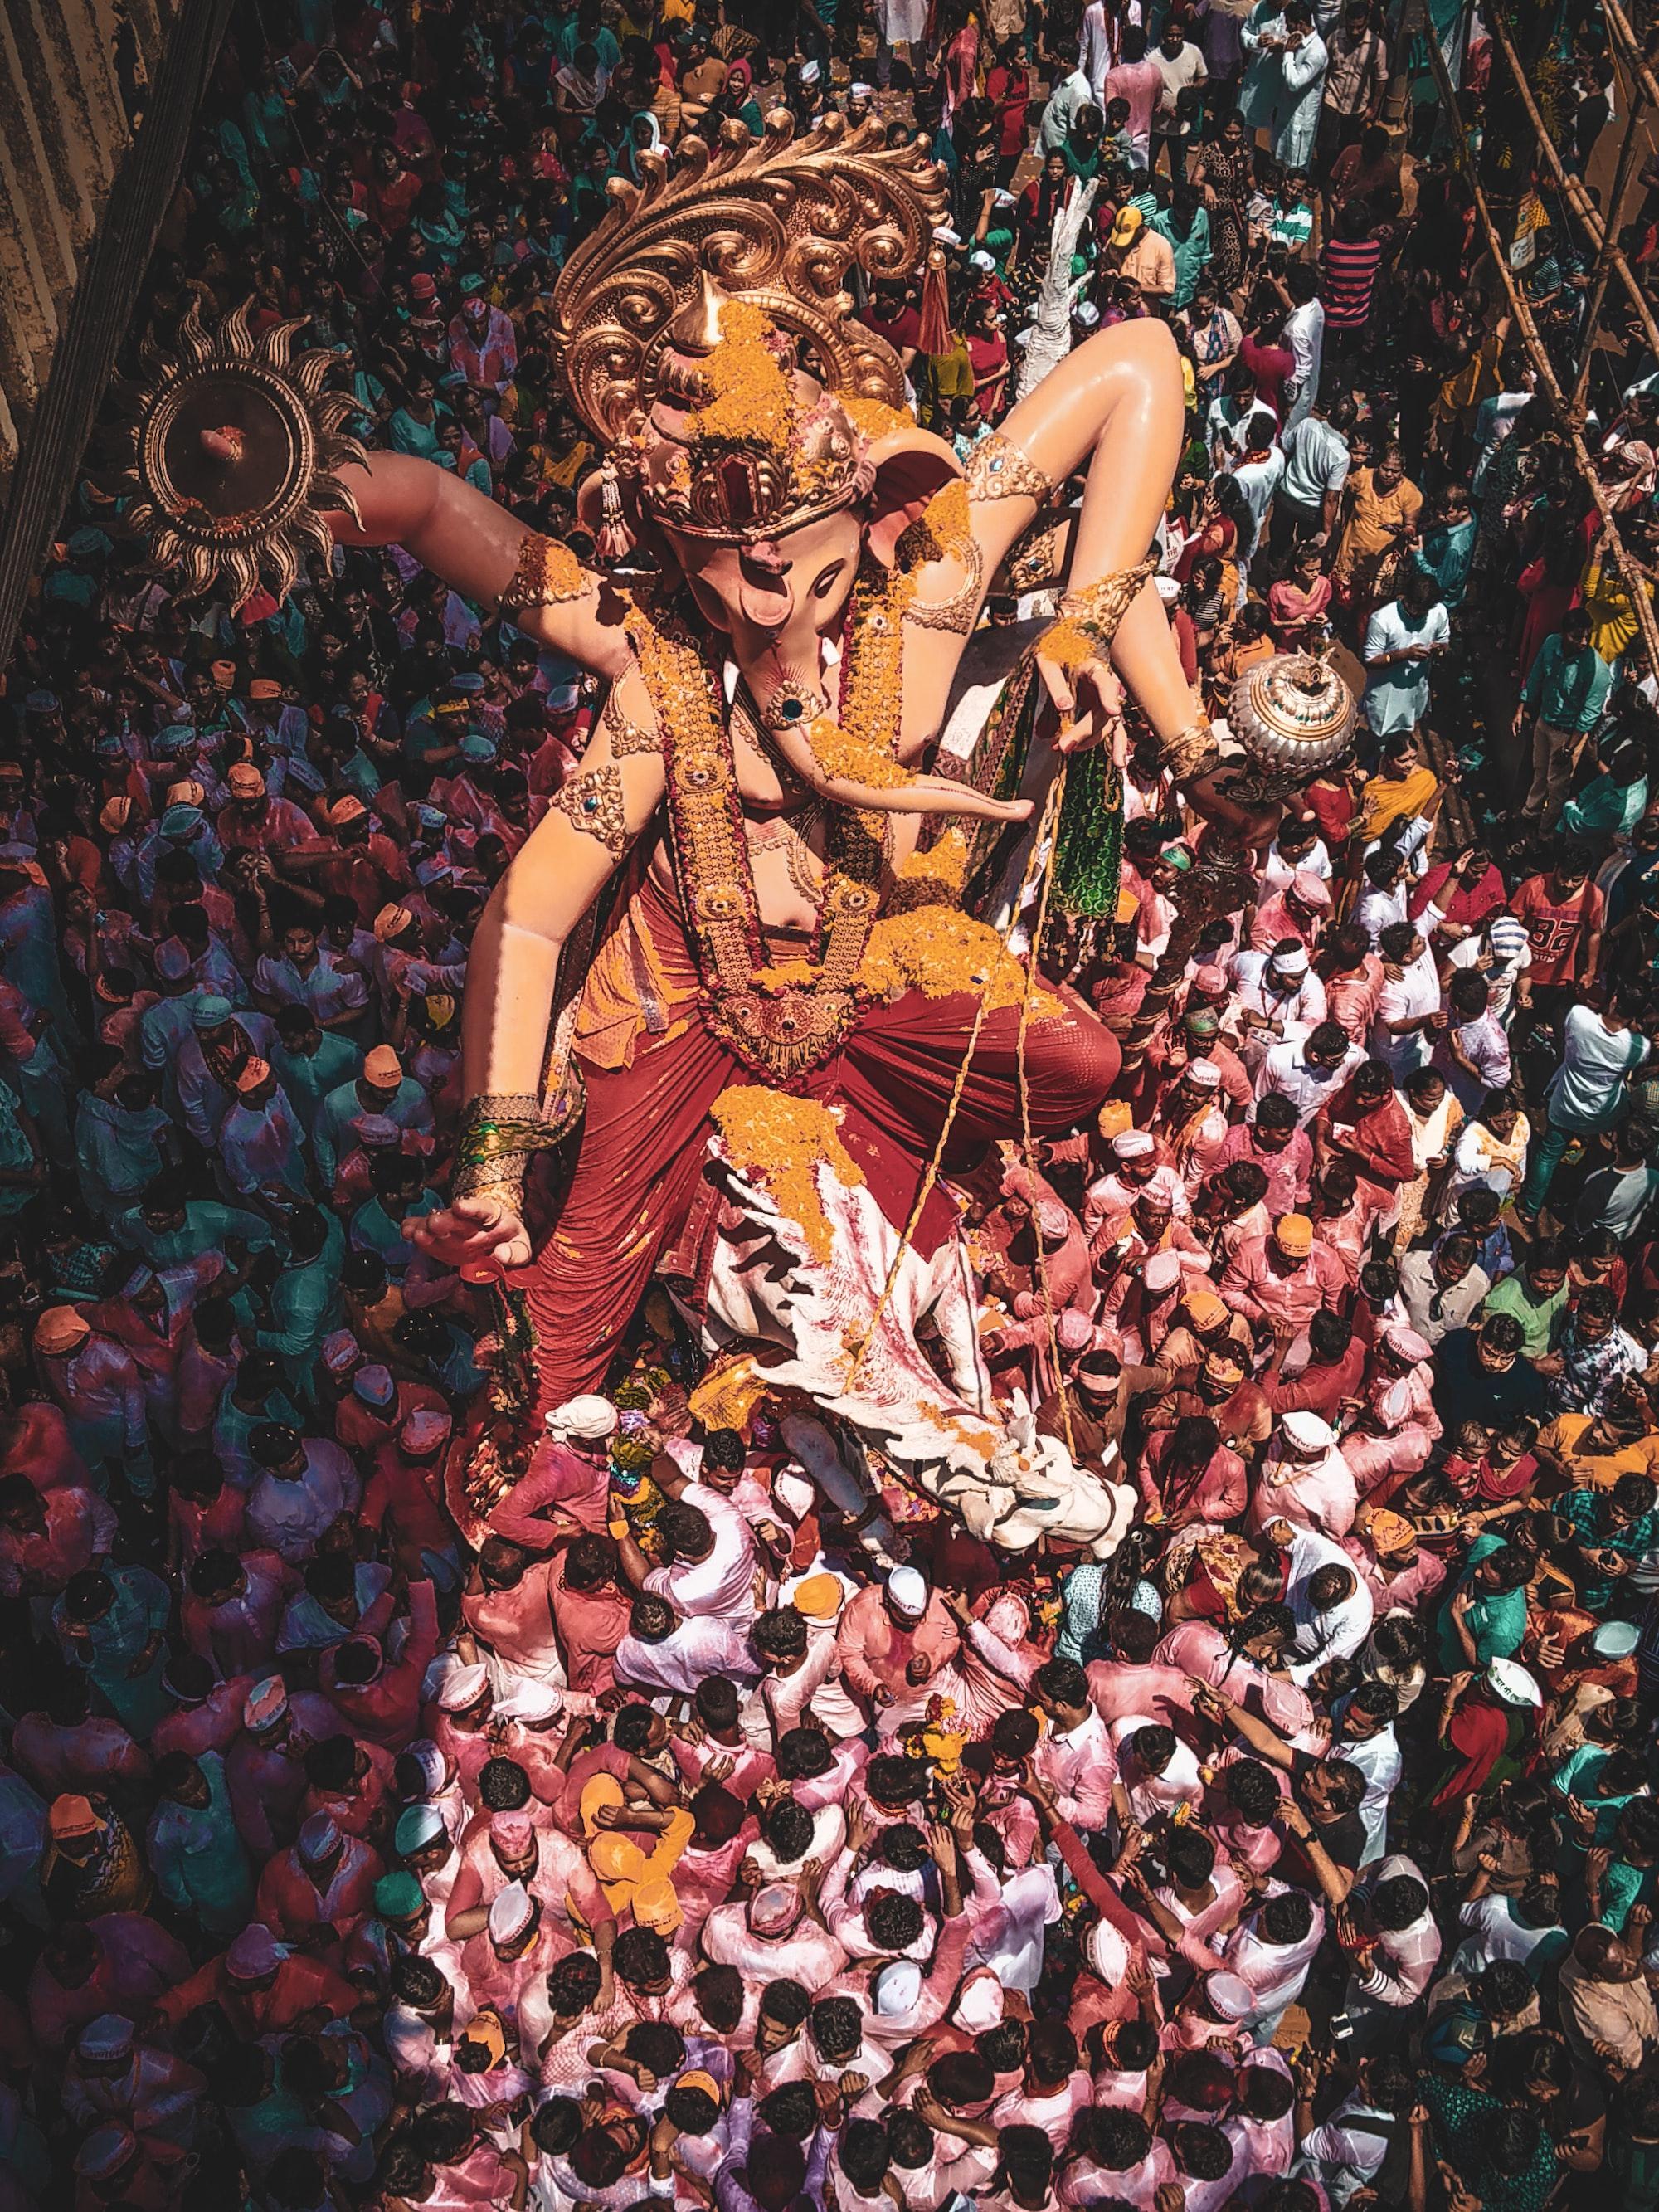 mumbai cha raja ganesh galli 2018 2019 2020 india mumbai maharashtra